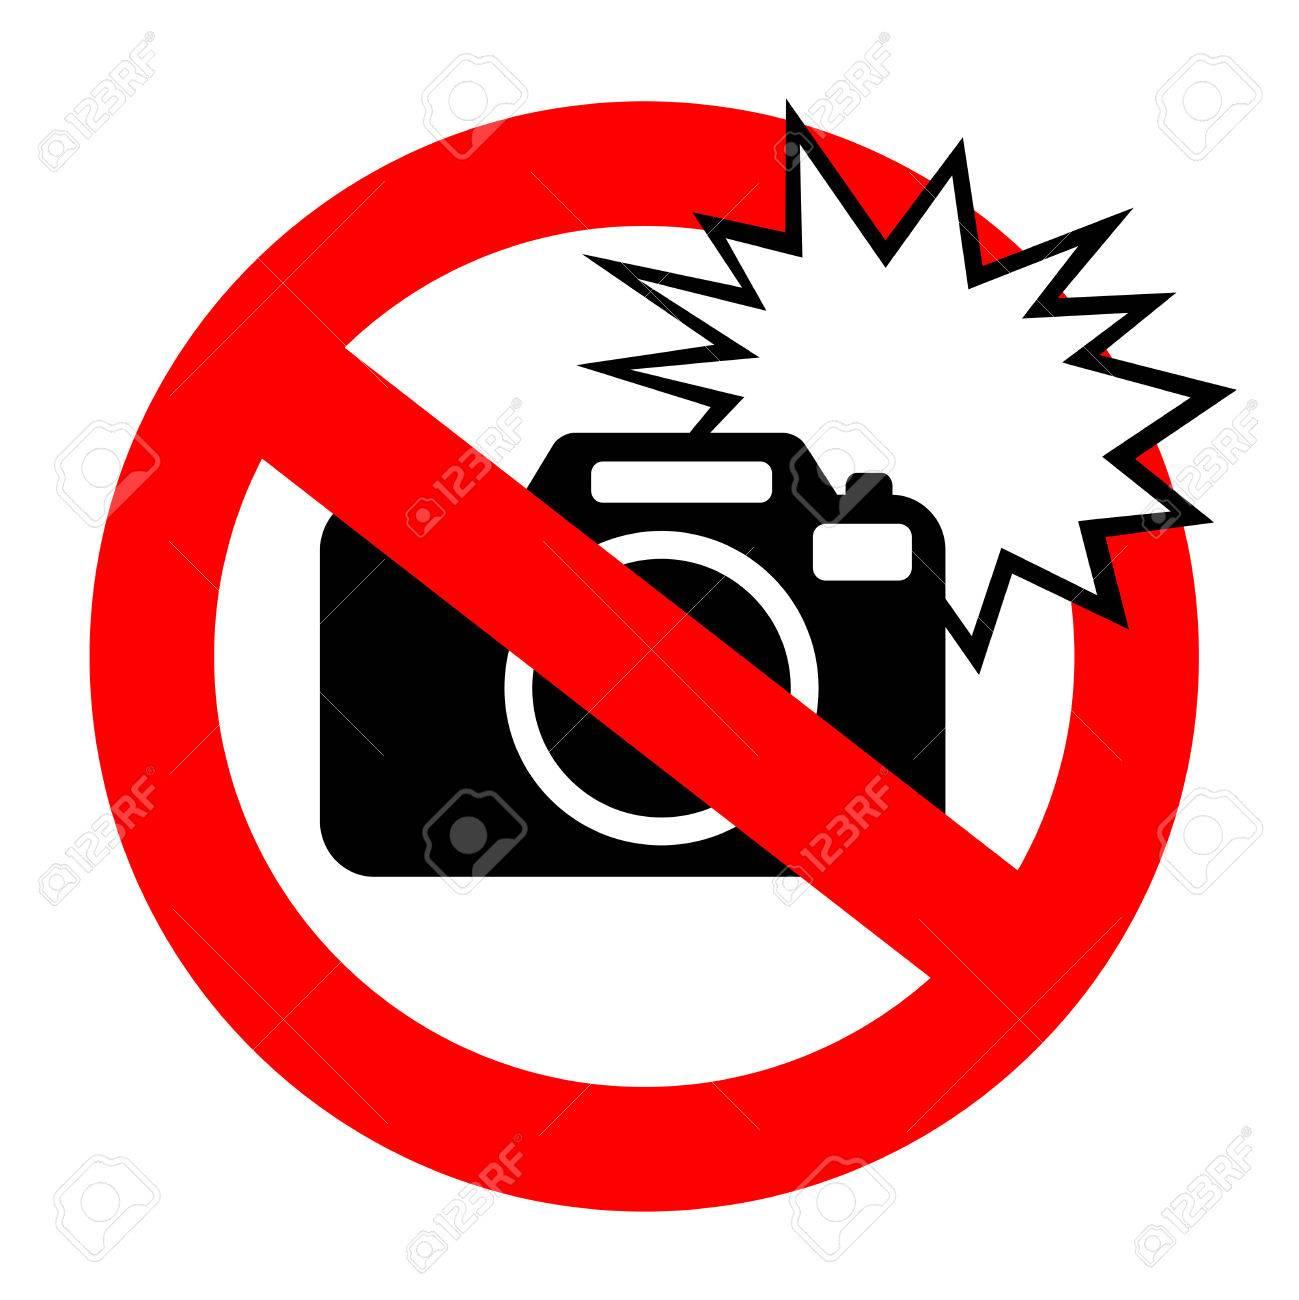 154 off camera flash stock illustrations cliparts and royalty free rh 123rf com Movie Camera Clip Art Food Clip Art